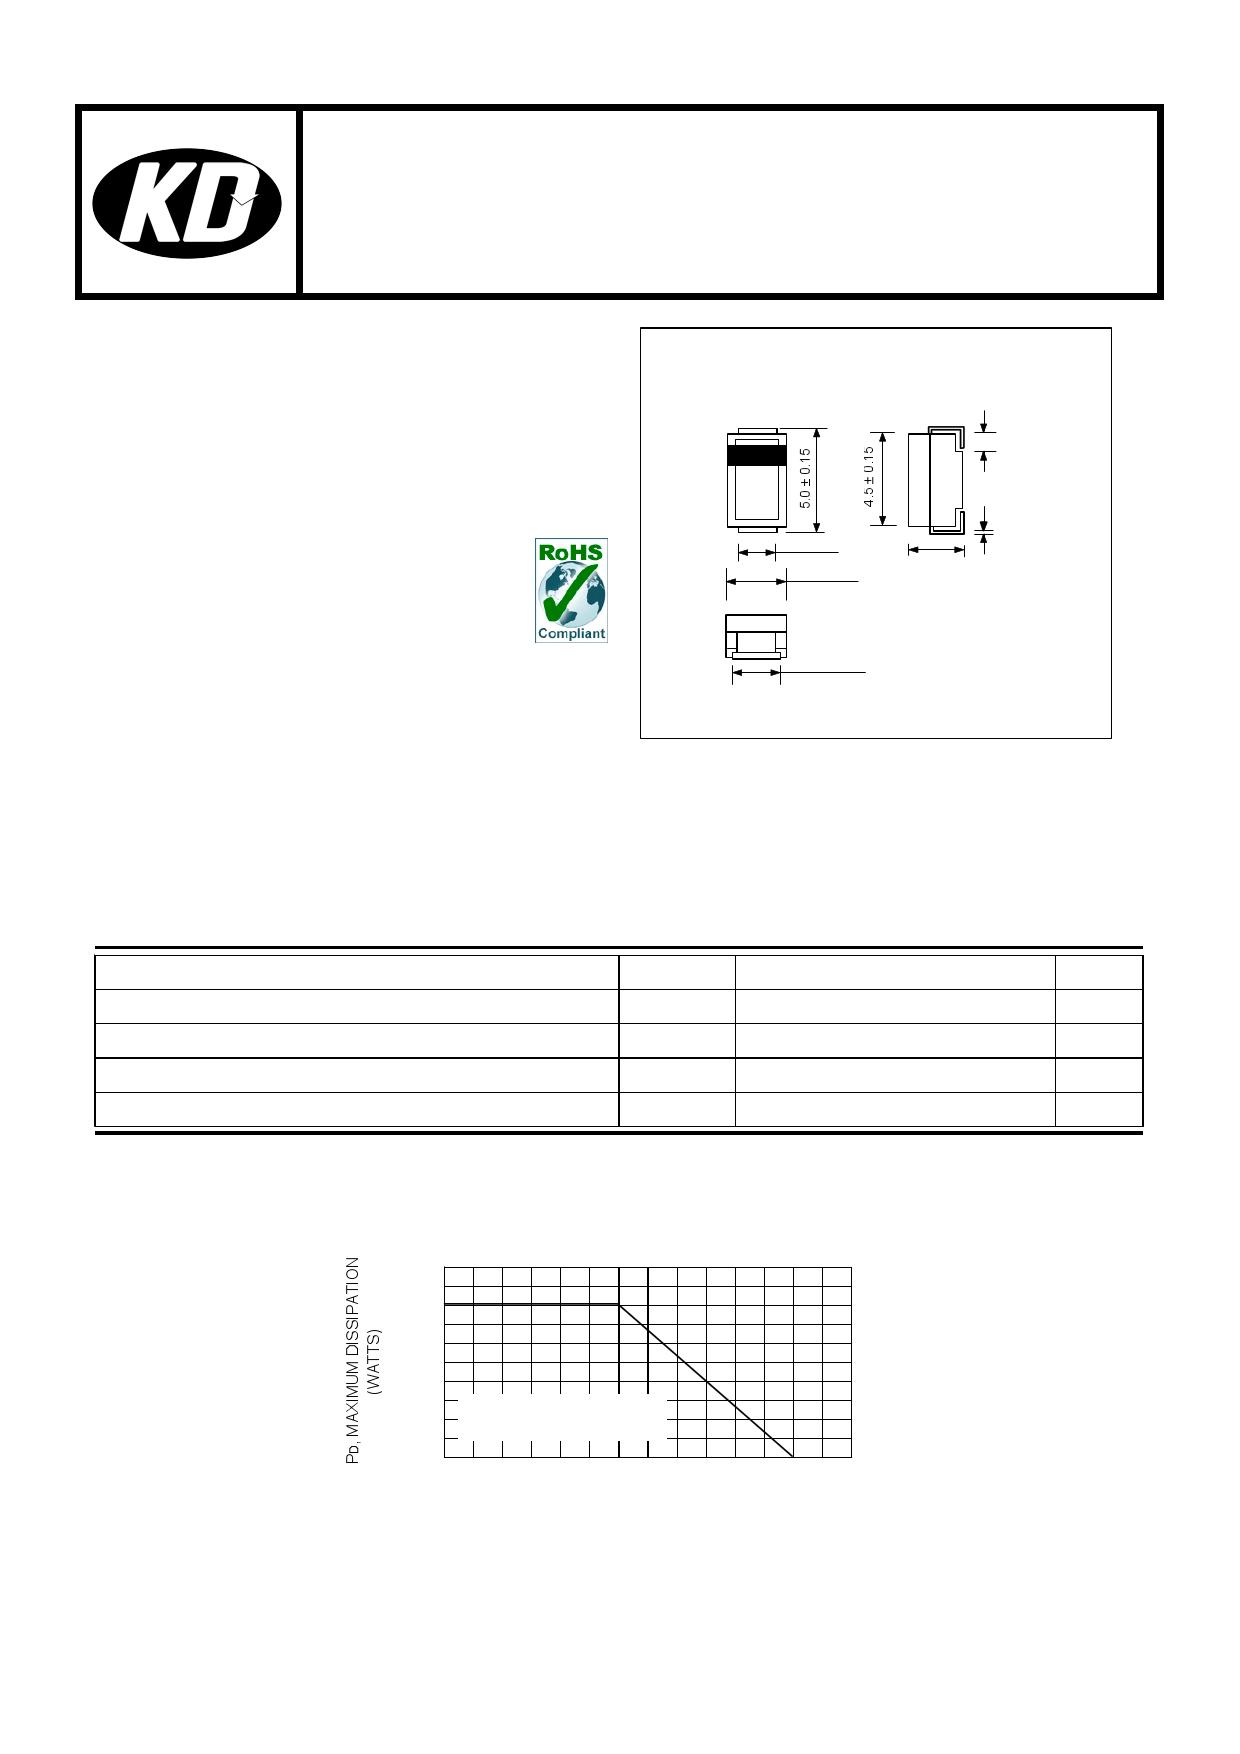 SZ4091 datasheet, circuit